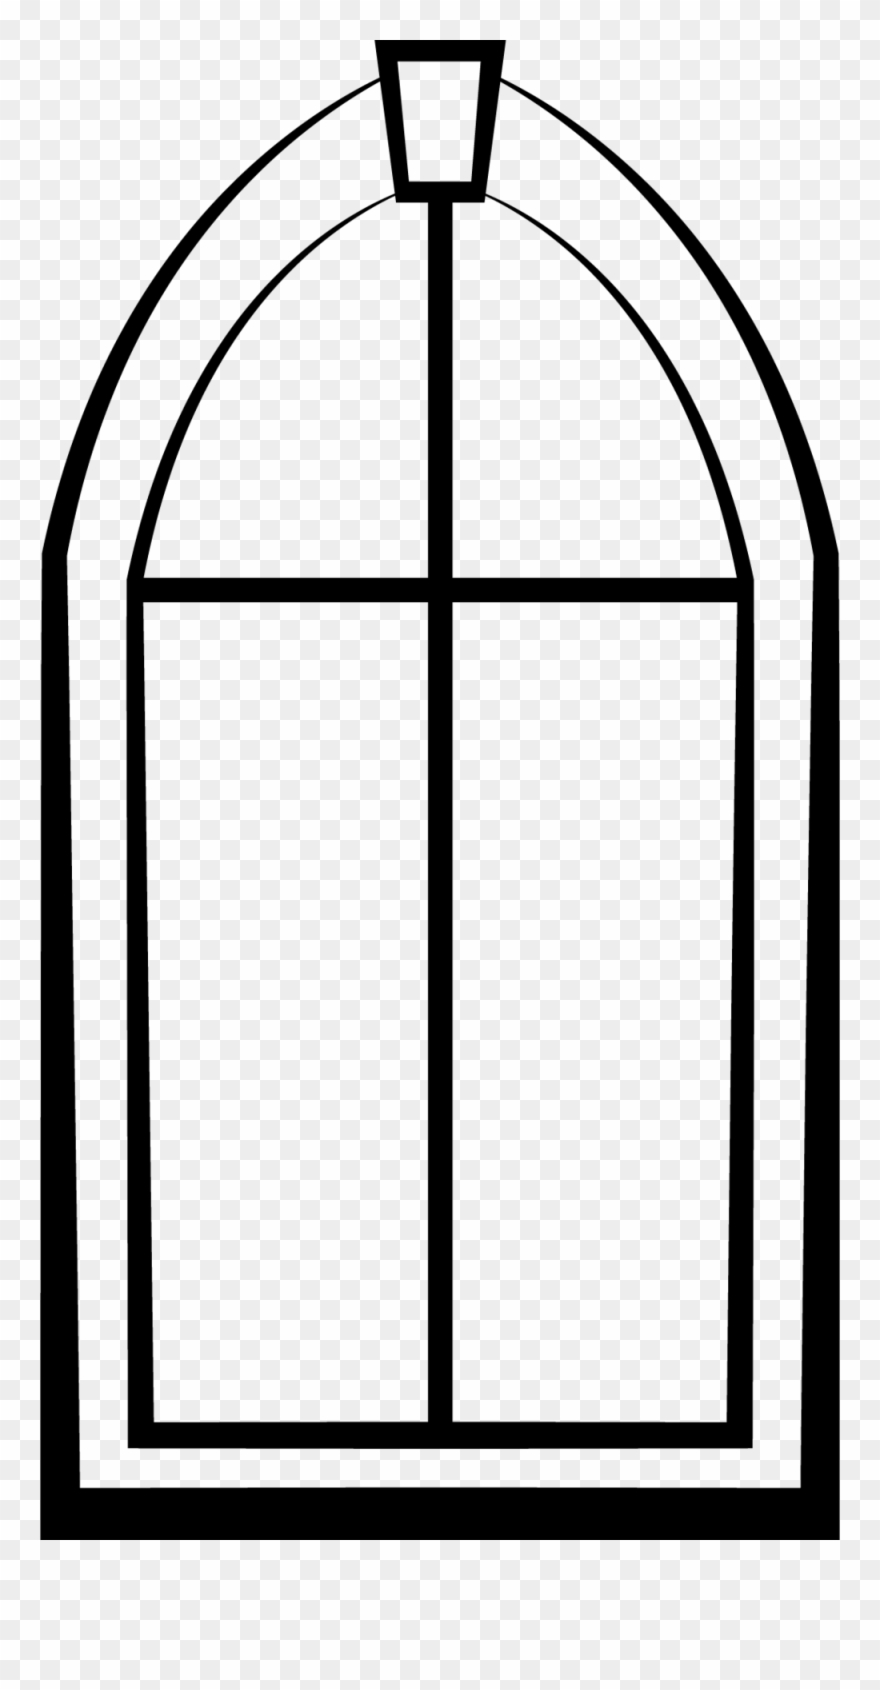 Windowpane clipart black & white